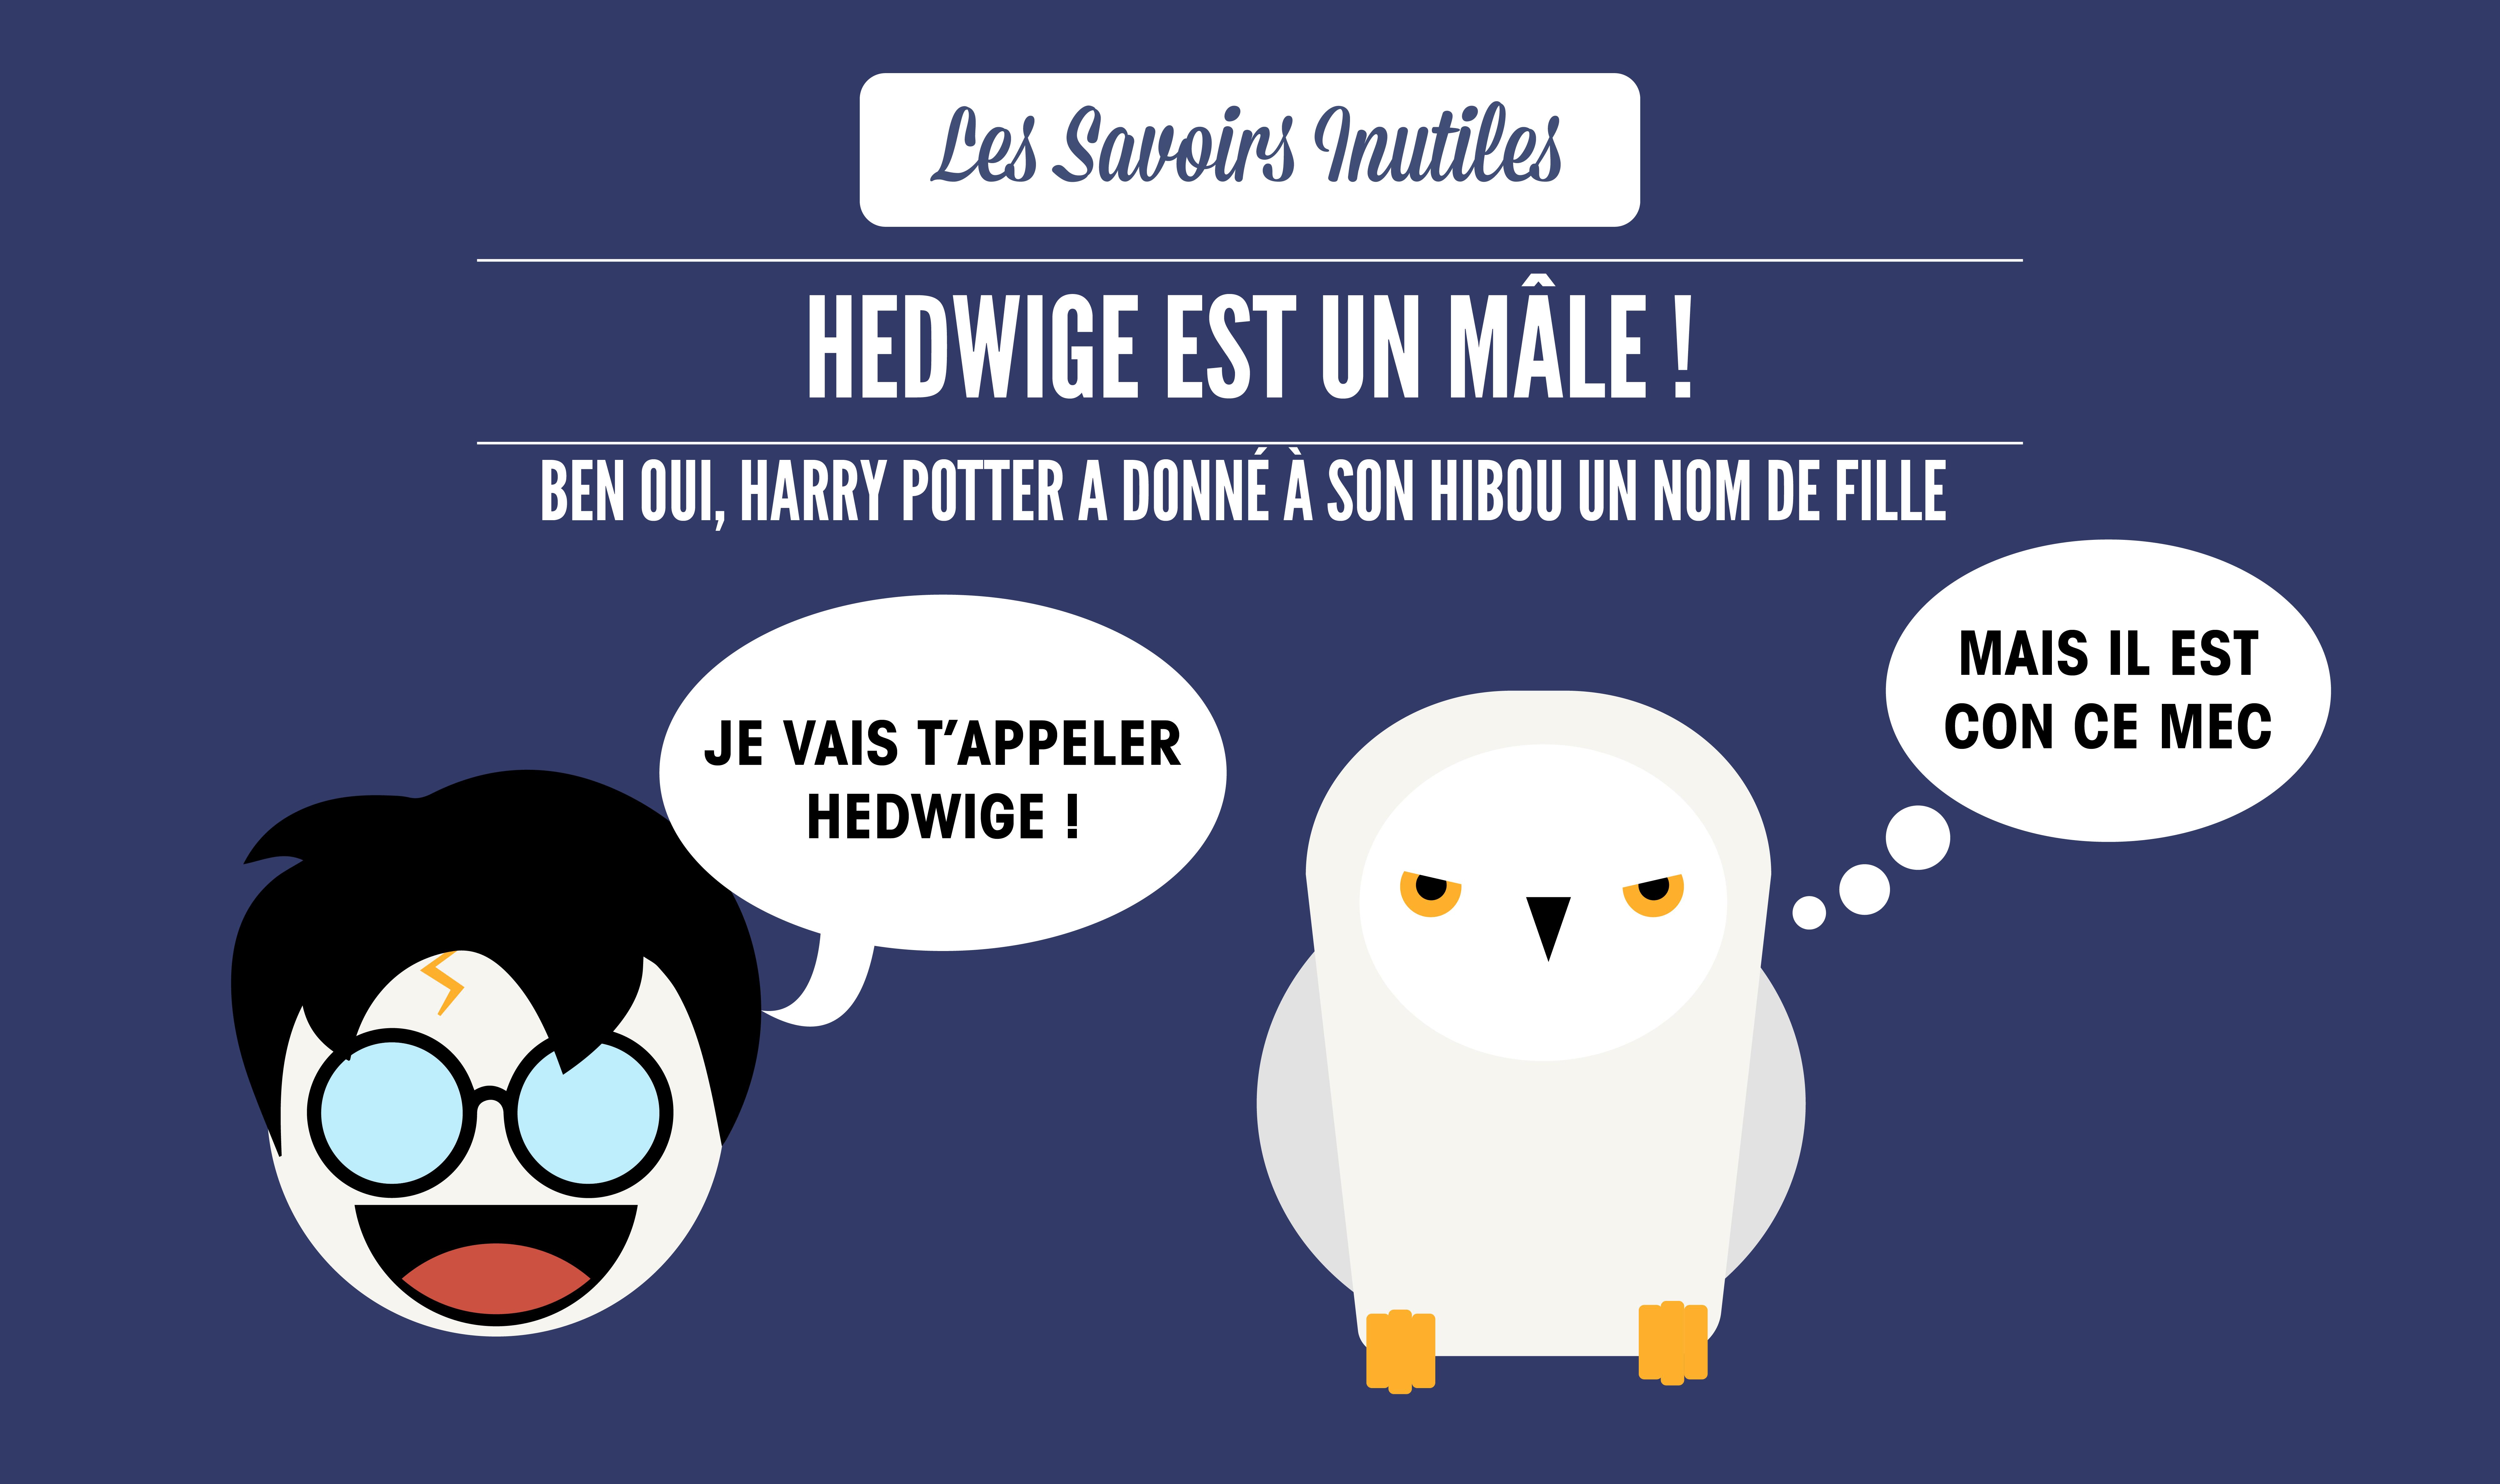 Savoirs Inutiles Template Harry Potter 04 Dessin Moto Facile